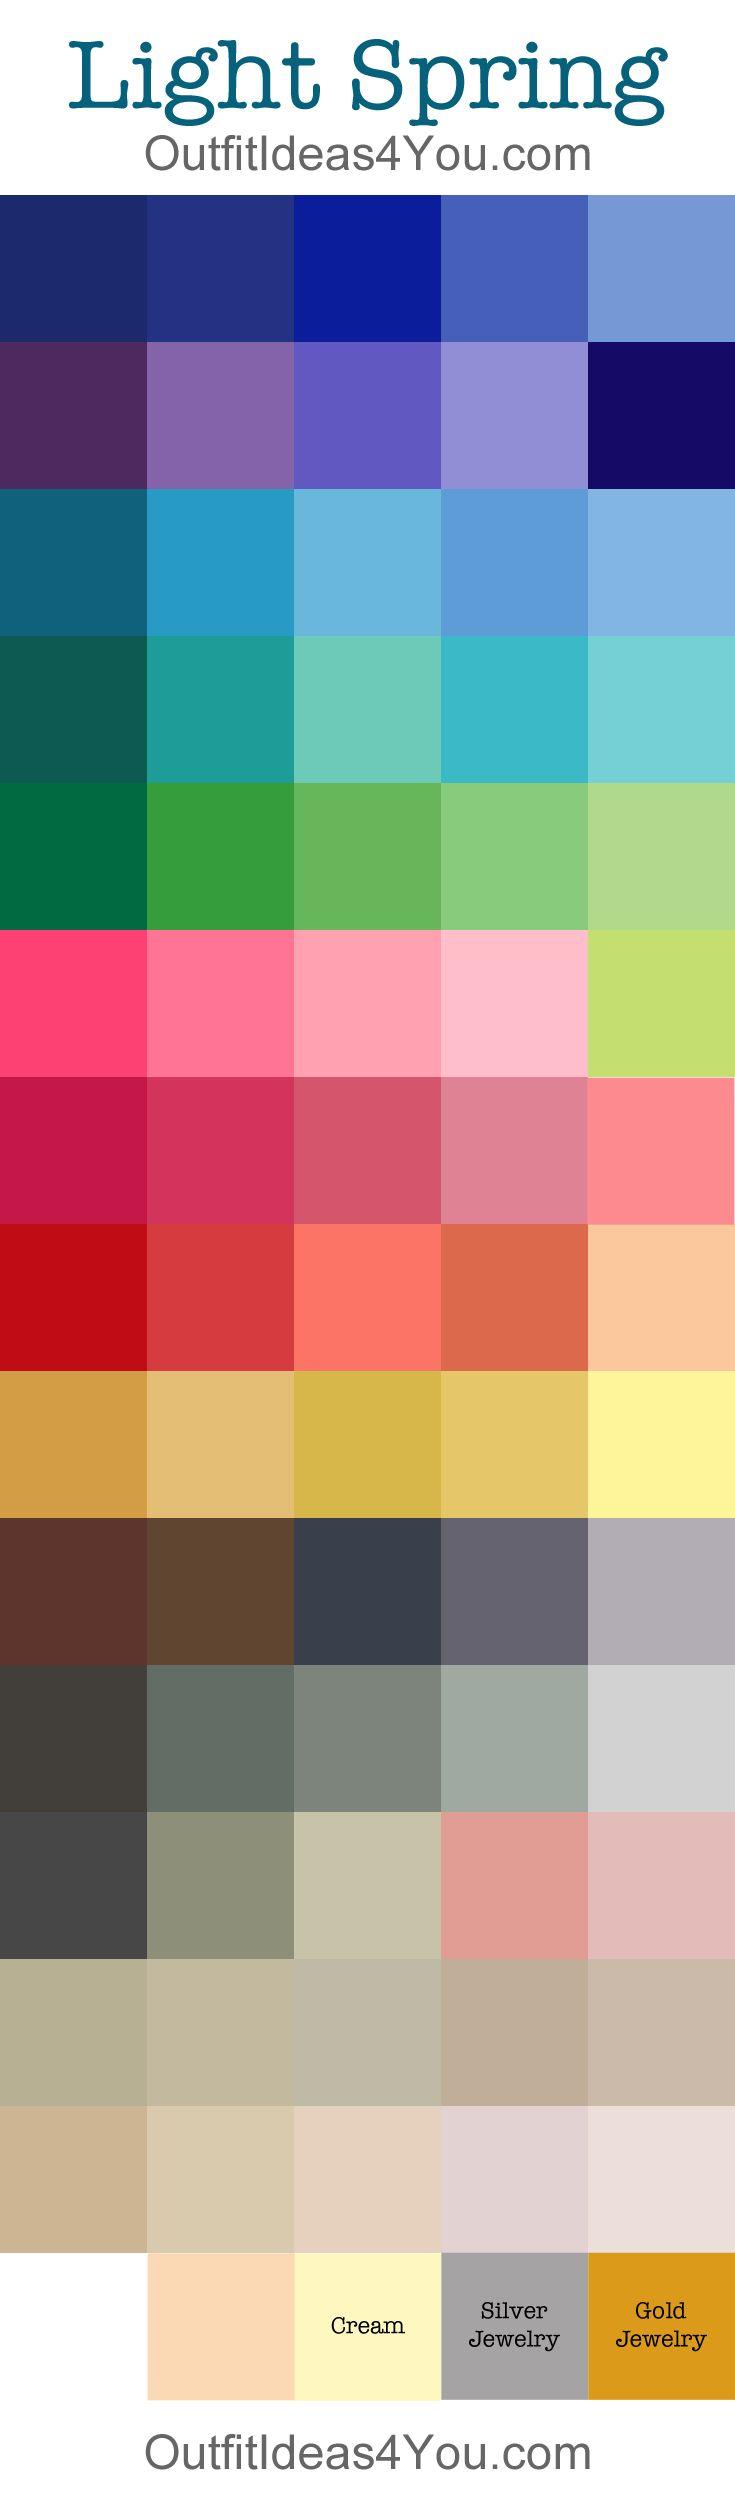 25 Best Ideas About Light Spring On Pinterest Light